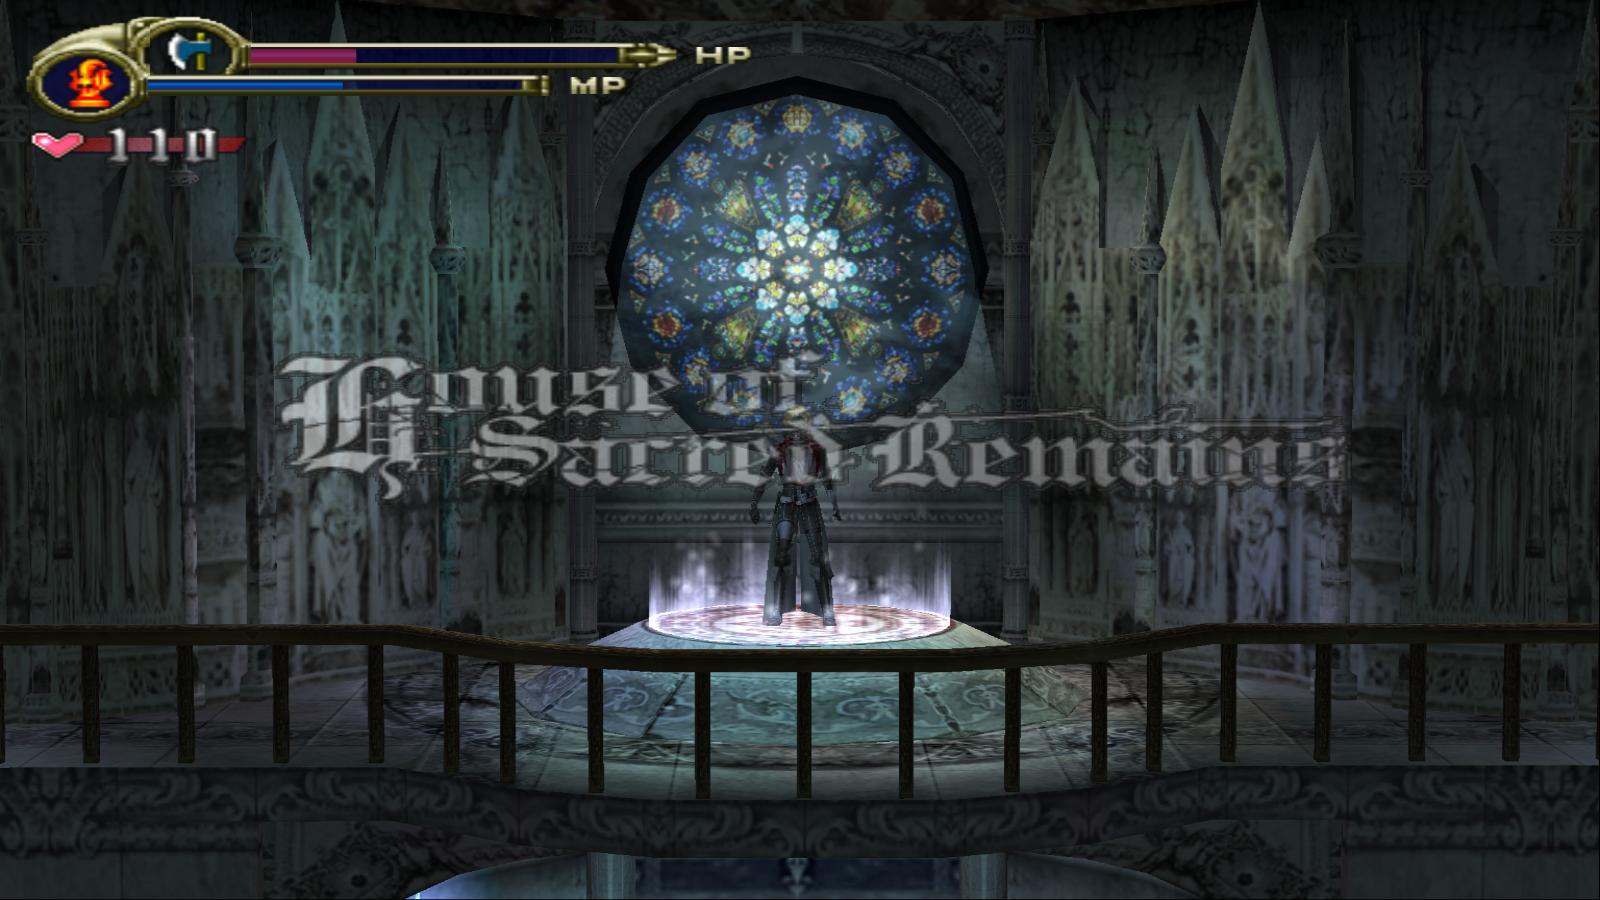 Castlevania: Lament of Innocence (Game) - Giant Bomb